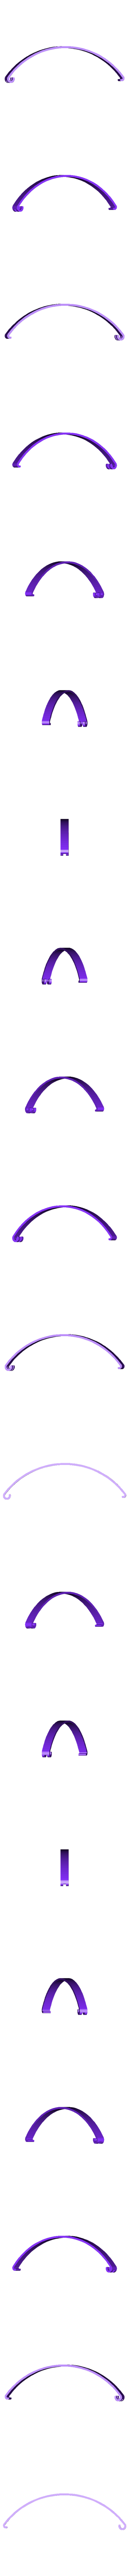 bag_clip_120mm_outside.stl Download free SCAD file Customizable Bag Clip • 3D printable design, WalterHsiao